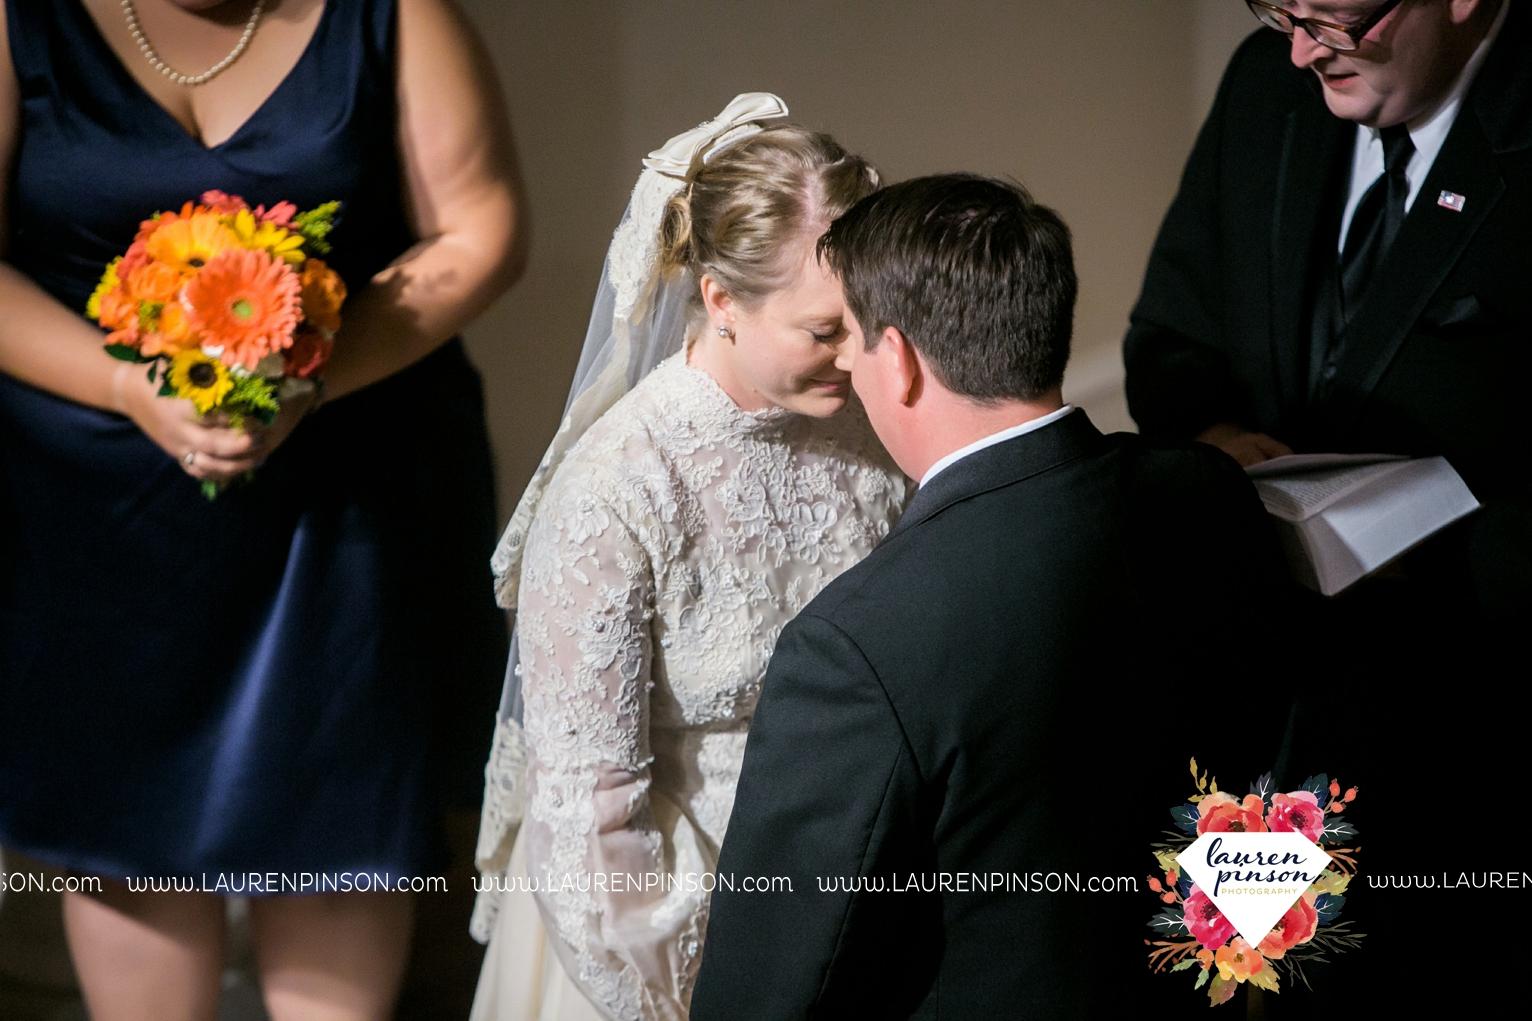 bells-texas-wedding-photography-at-willowood-ranch-chapel-north-texas-wichita-falls-wedding-photographer_1874.jpg